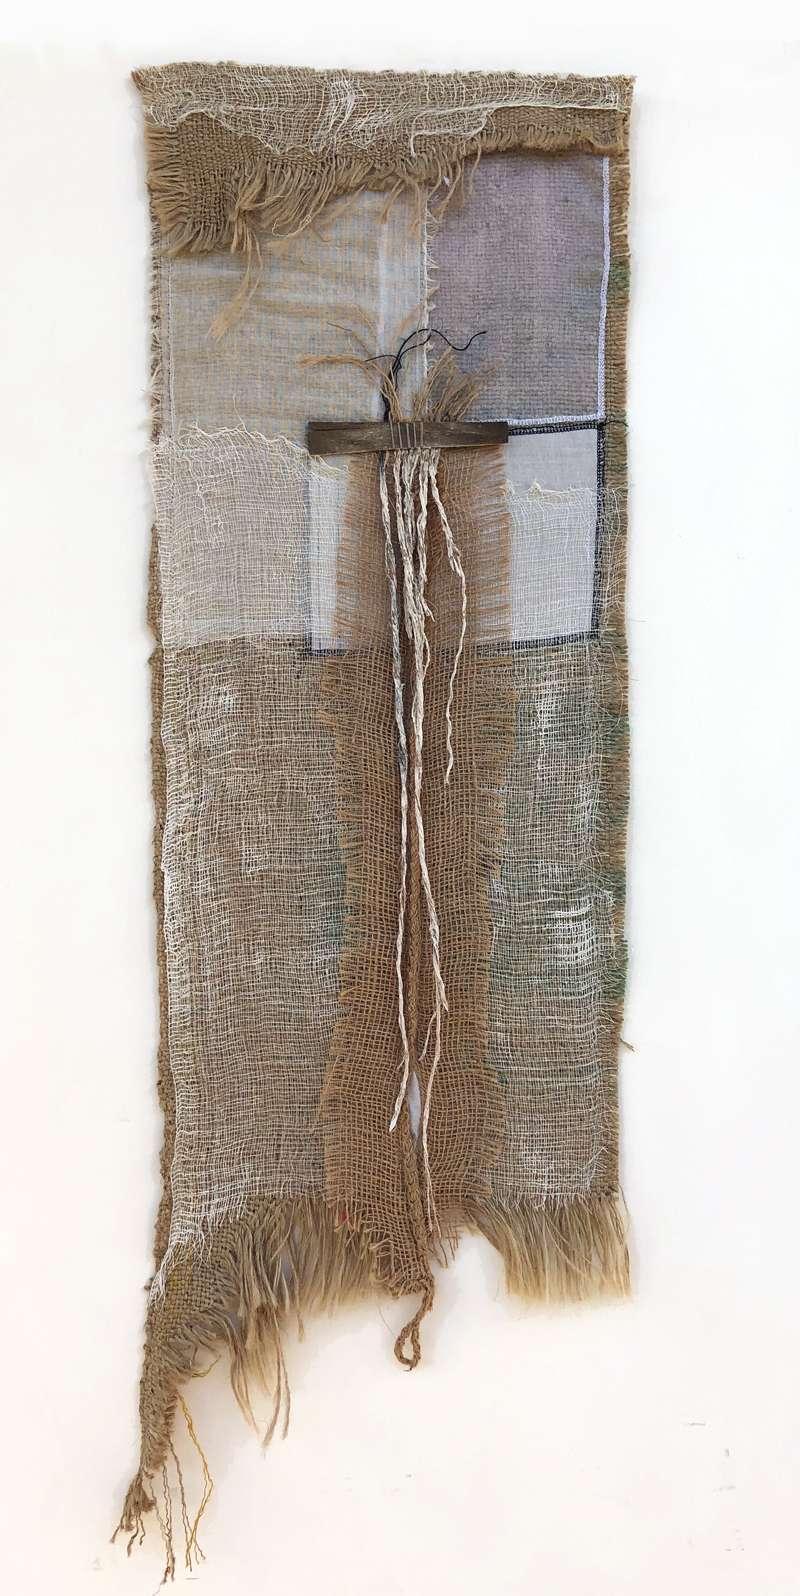 Burlap and Fiber Art by Janet Jaffke